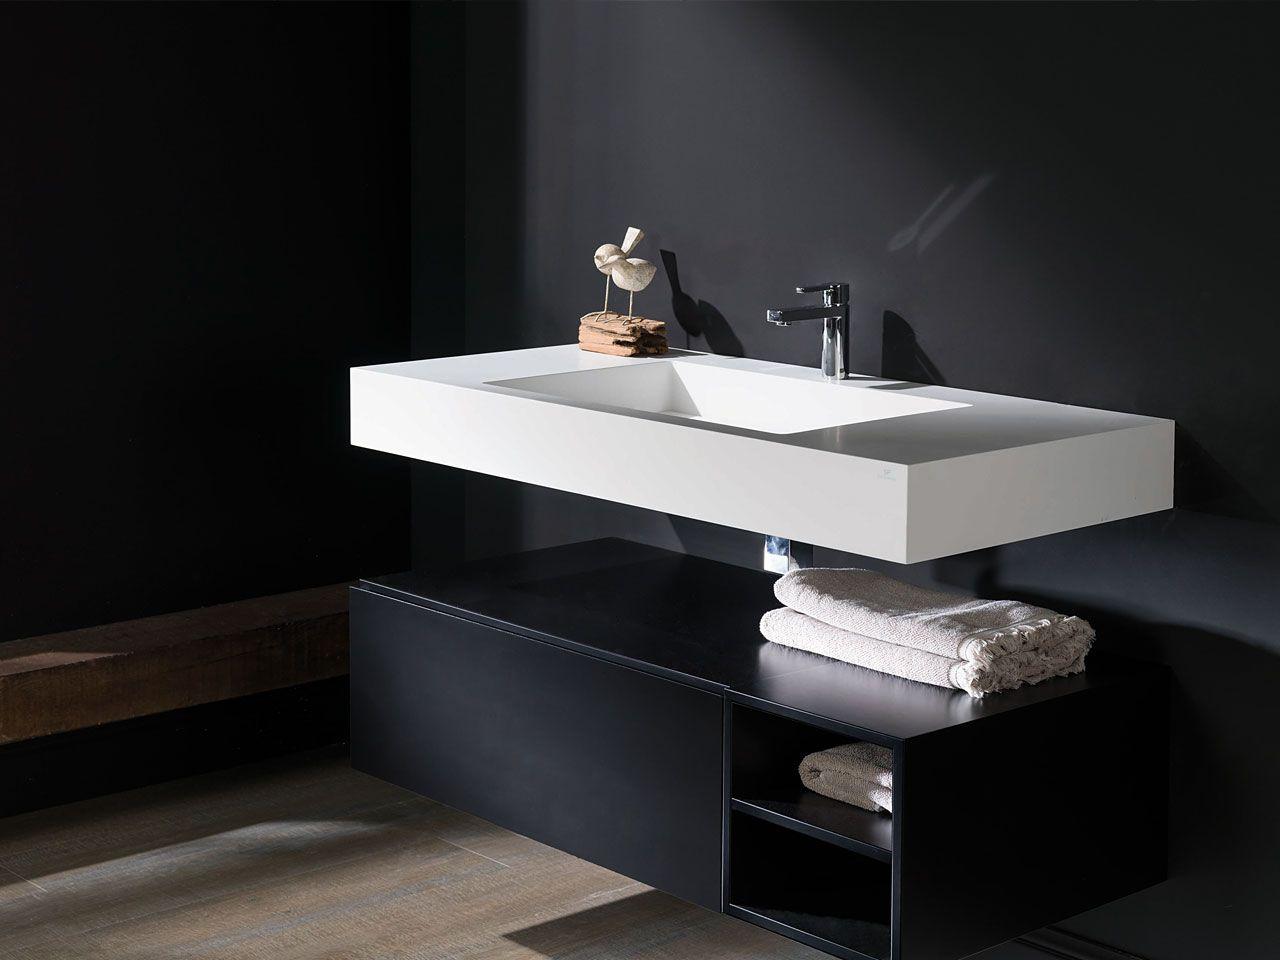 mobilier por la salle de bains porcelanosacom - Salle De Bain Porcelanosa